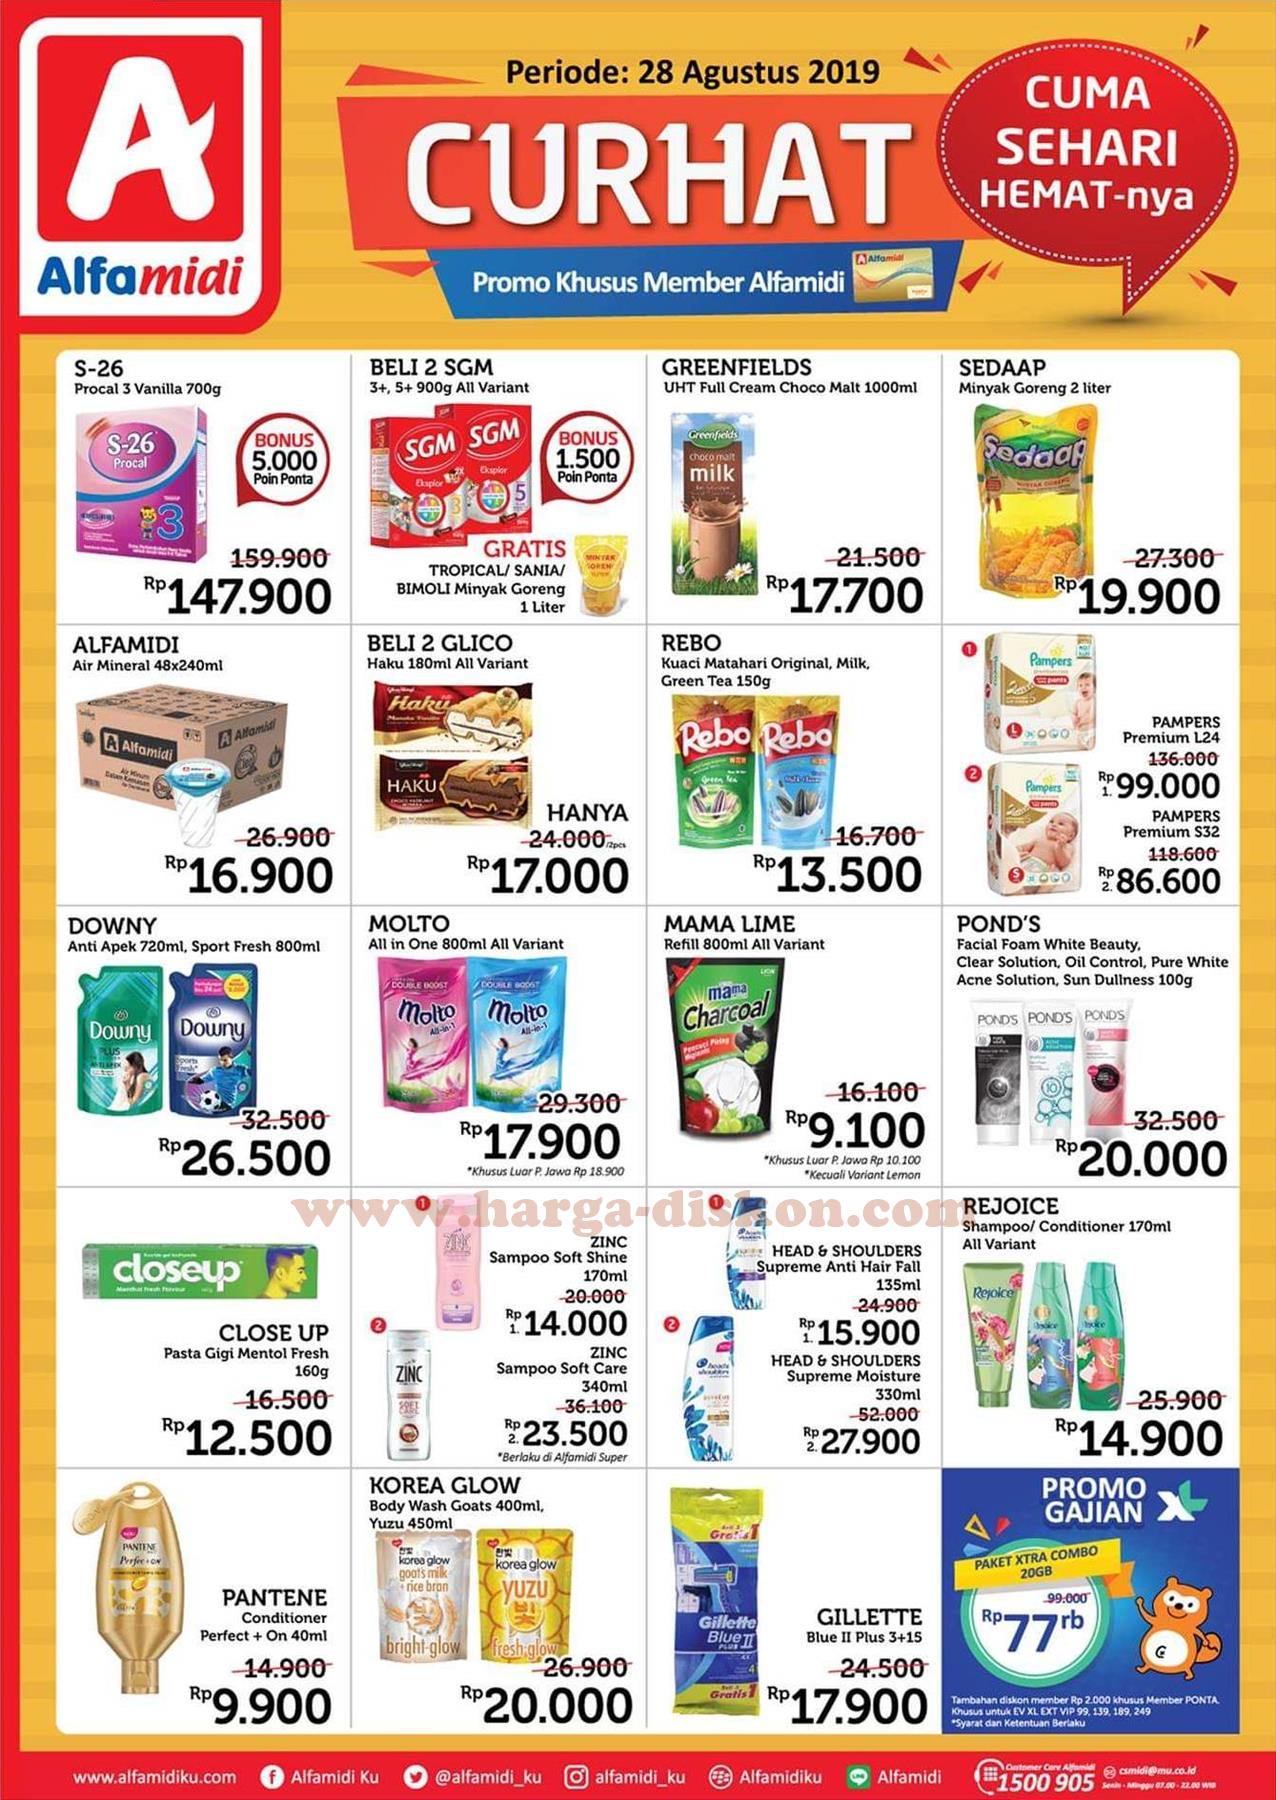 Promo Alfamidi Promo Cuma Sehari Hemat Periode 28 Agustus 2019 Harga Diskon